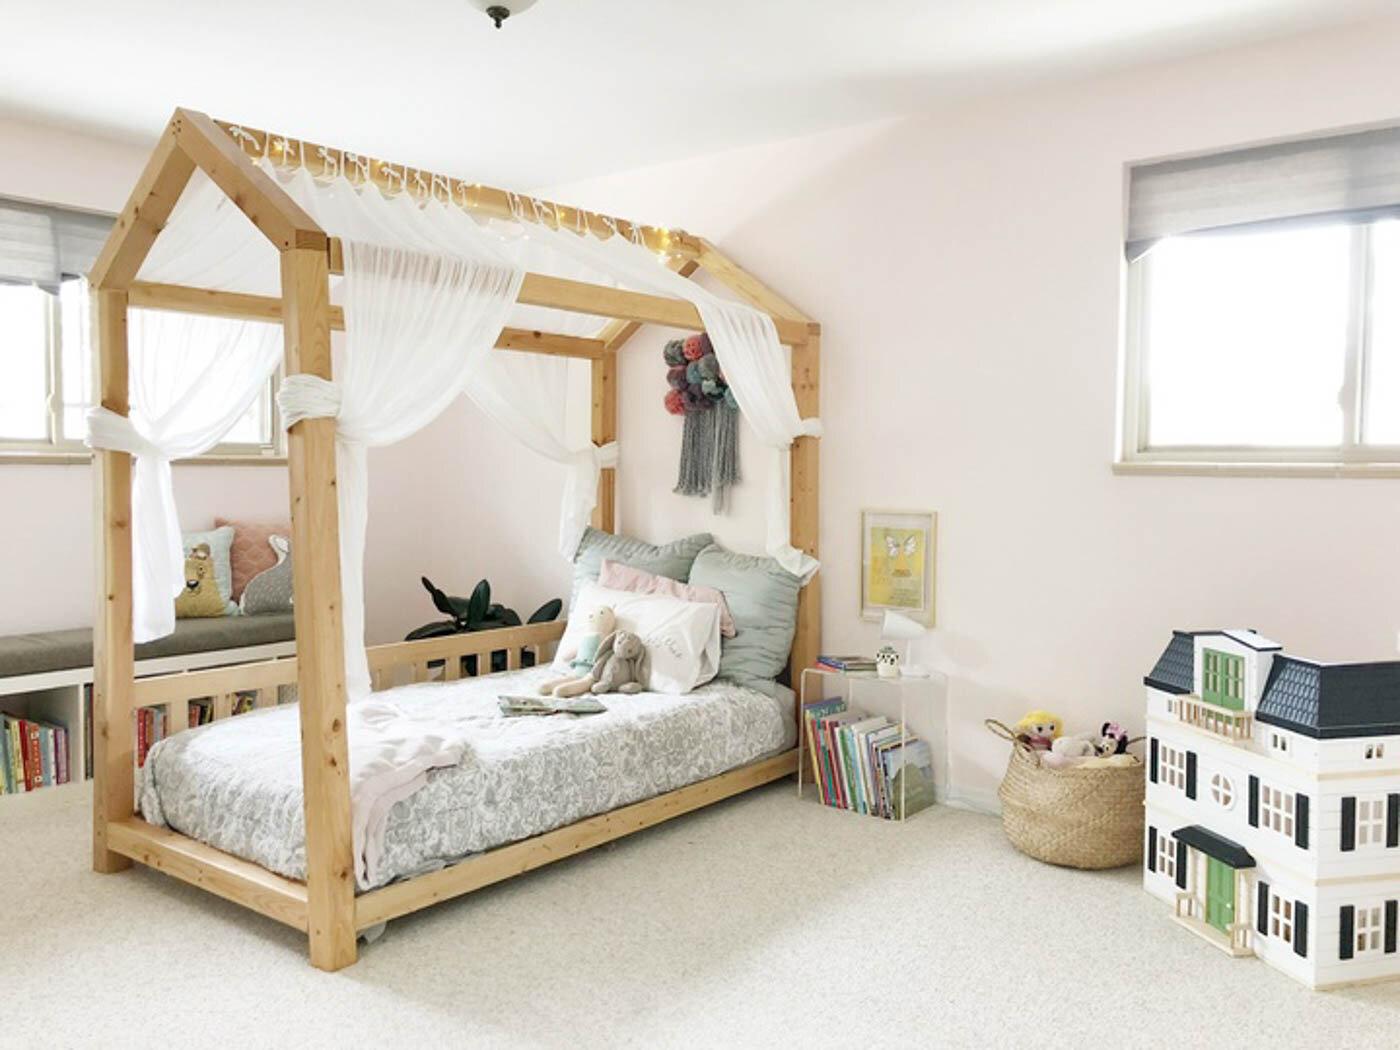 MinimalCharm-DenverCO-natural-light-photography-studio-lifestyle-photoshoot-location-editorial-commercial-photography-42.jpg